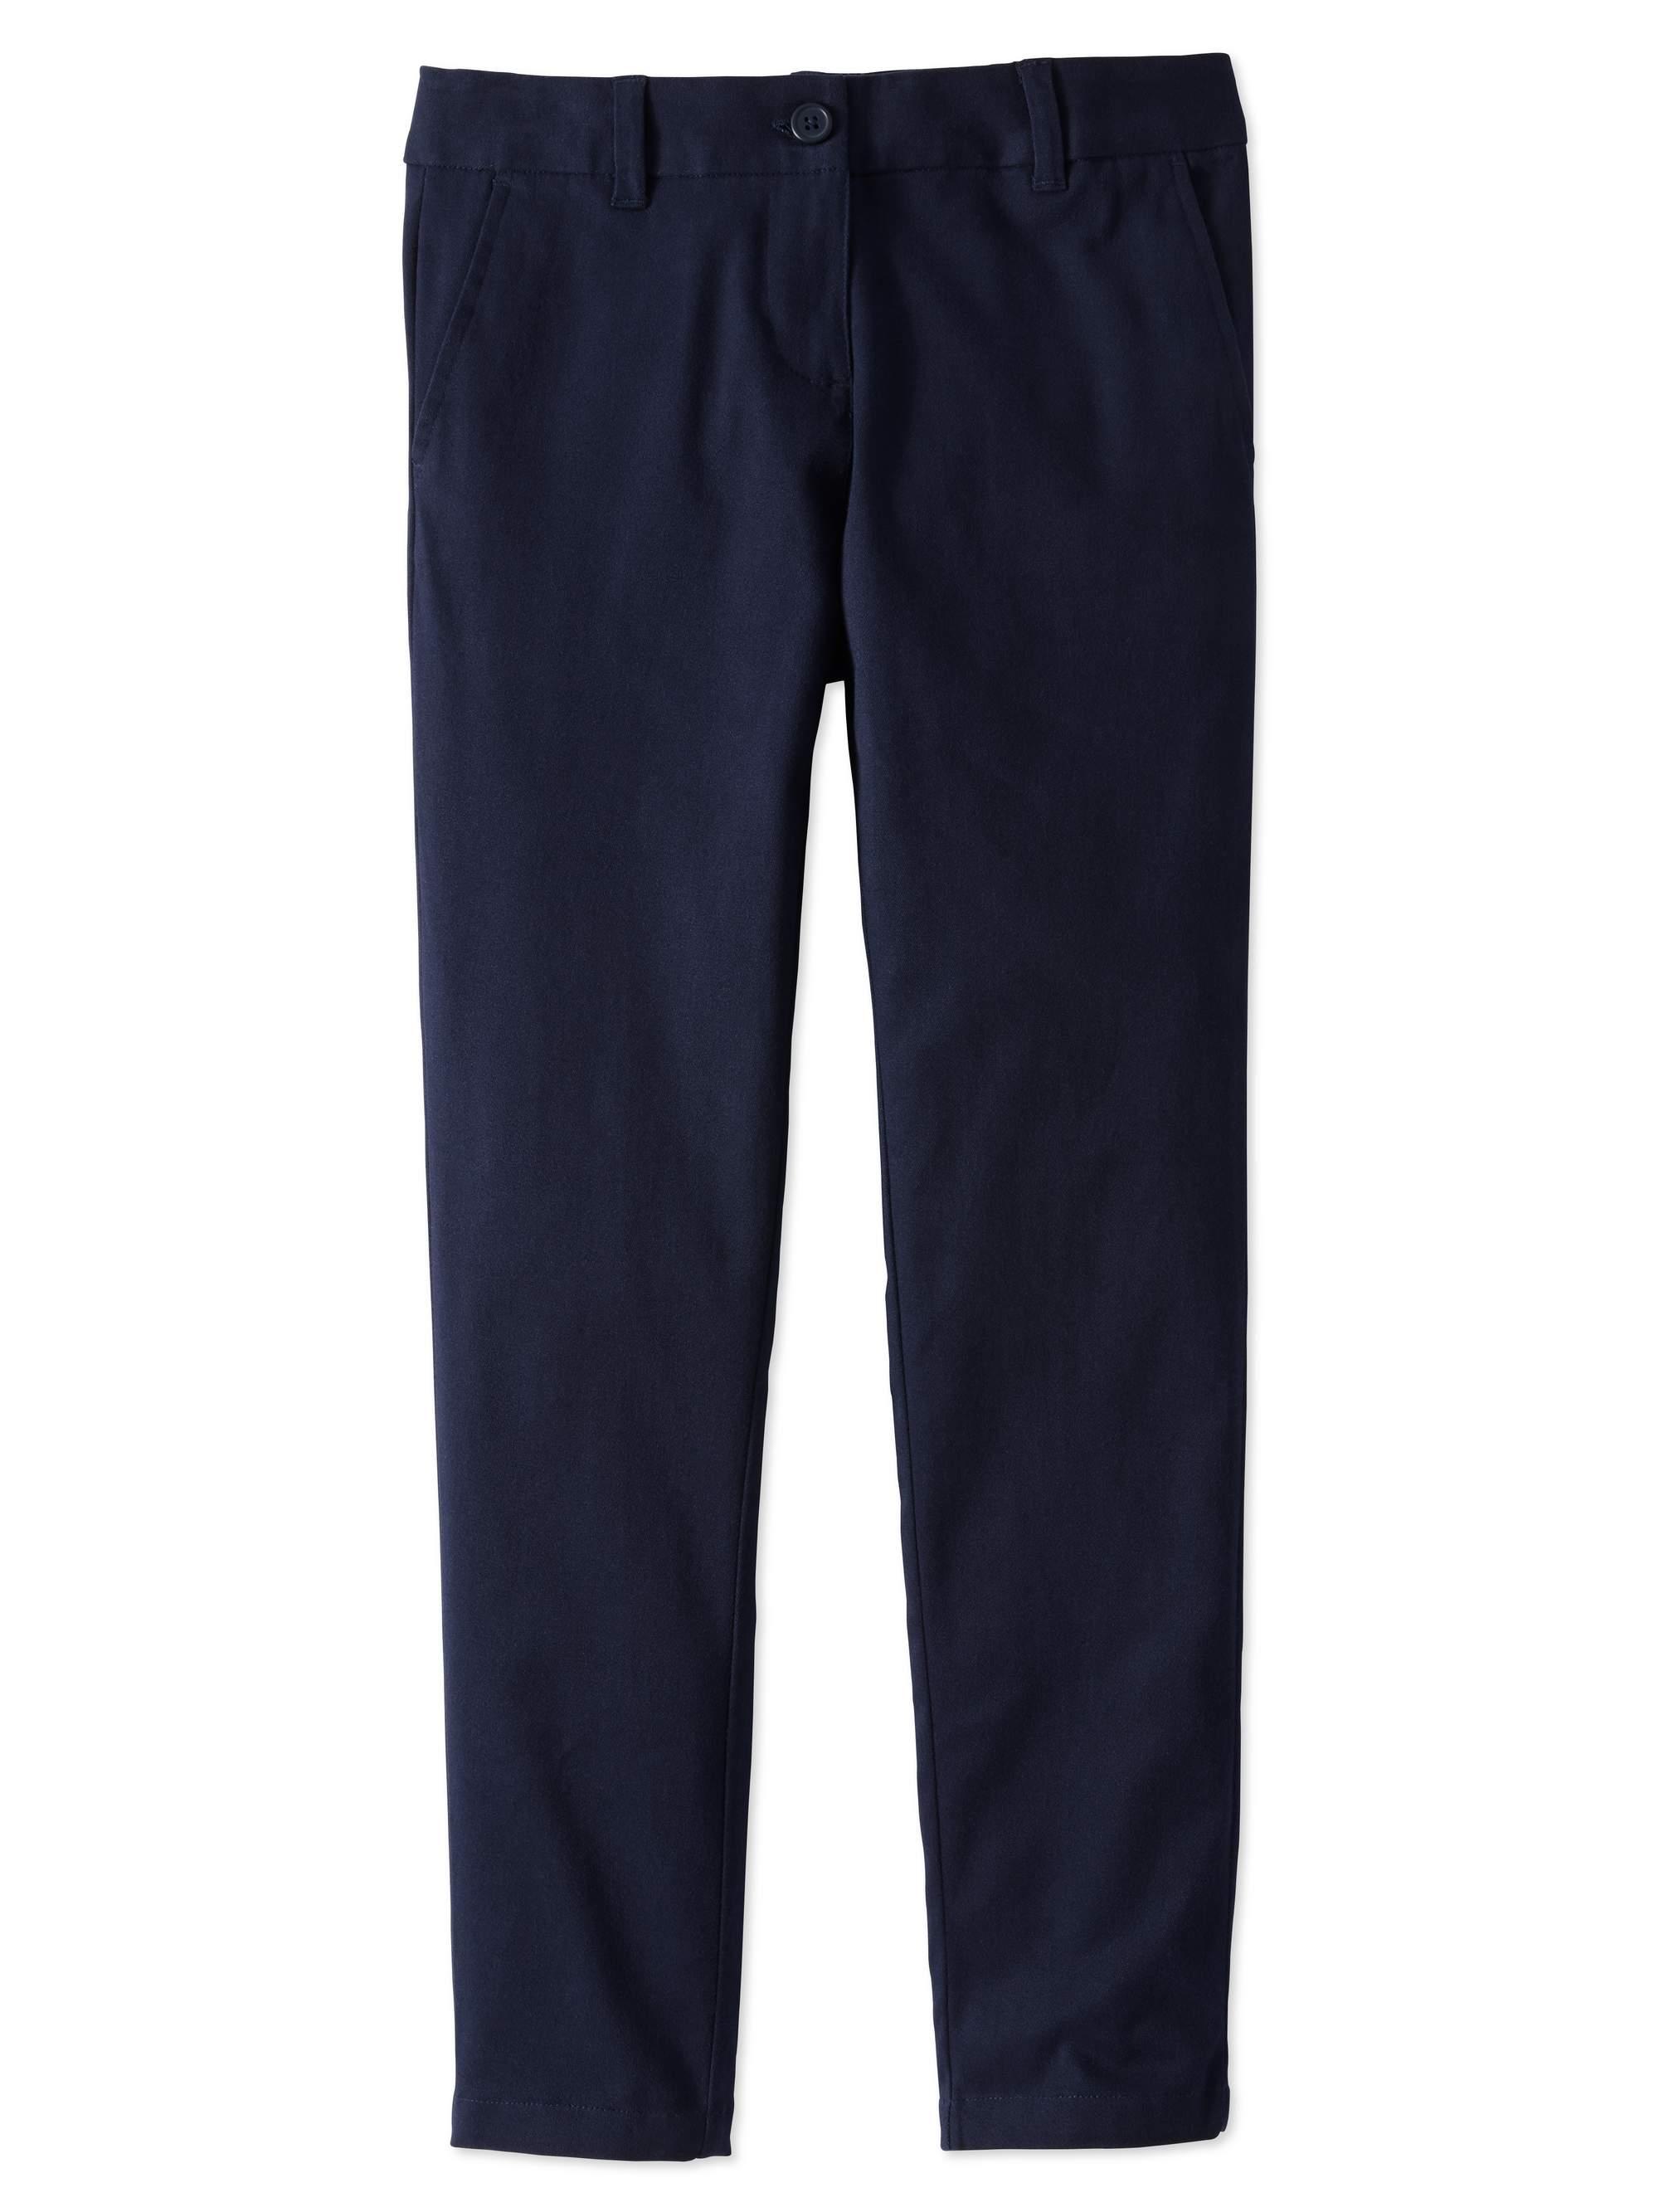 Girls Plus School Uniform Stretch Twill Skinny Pants